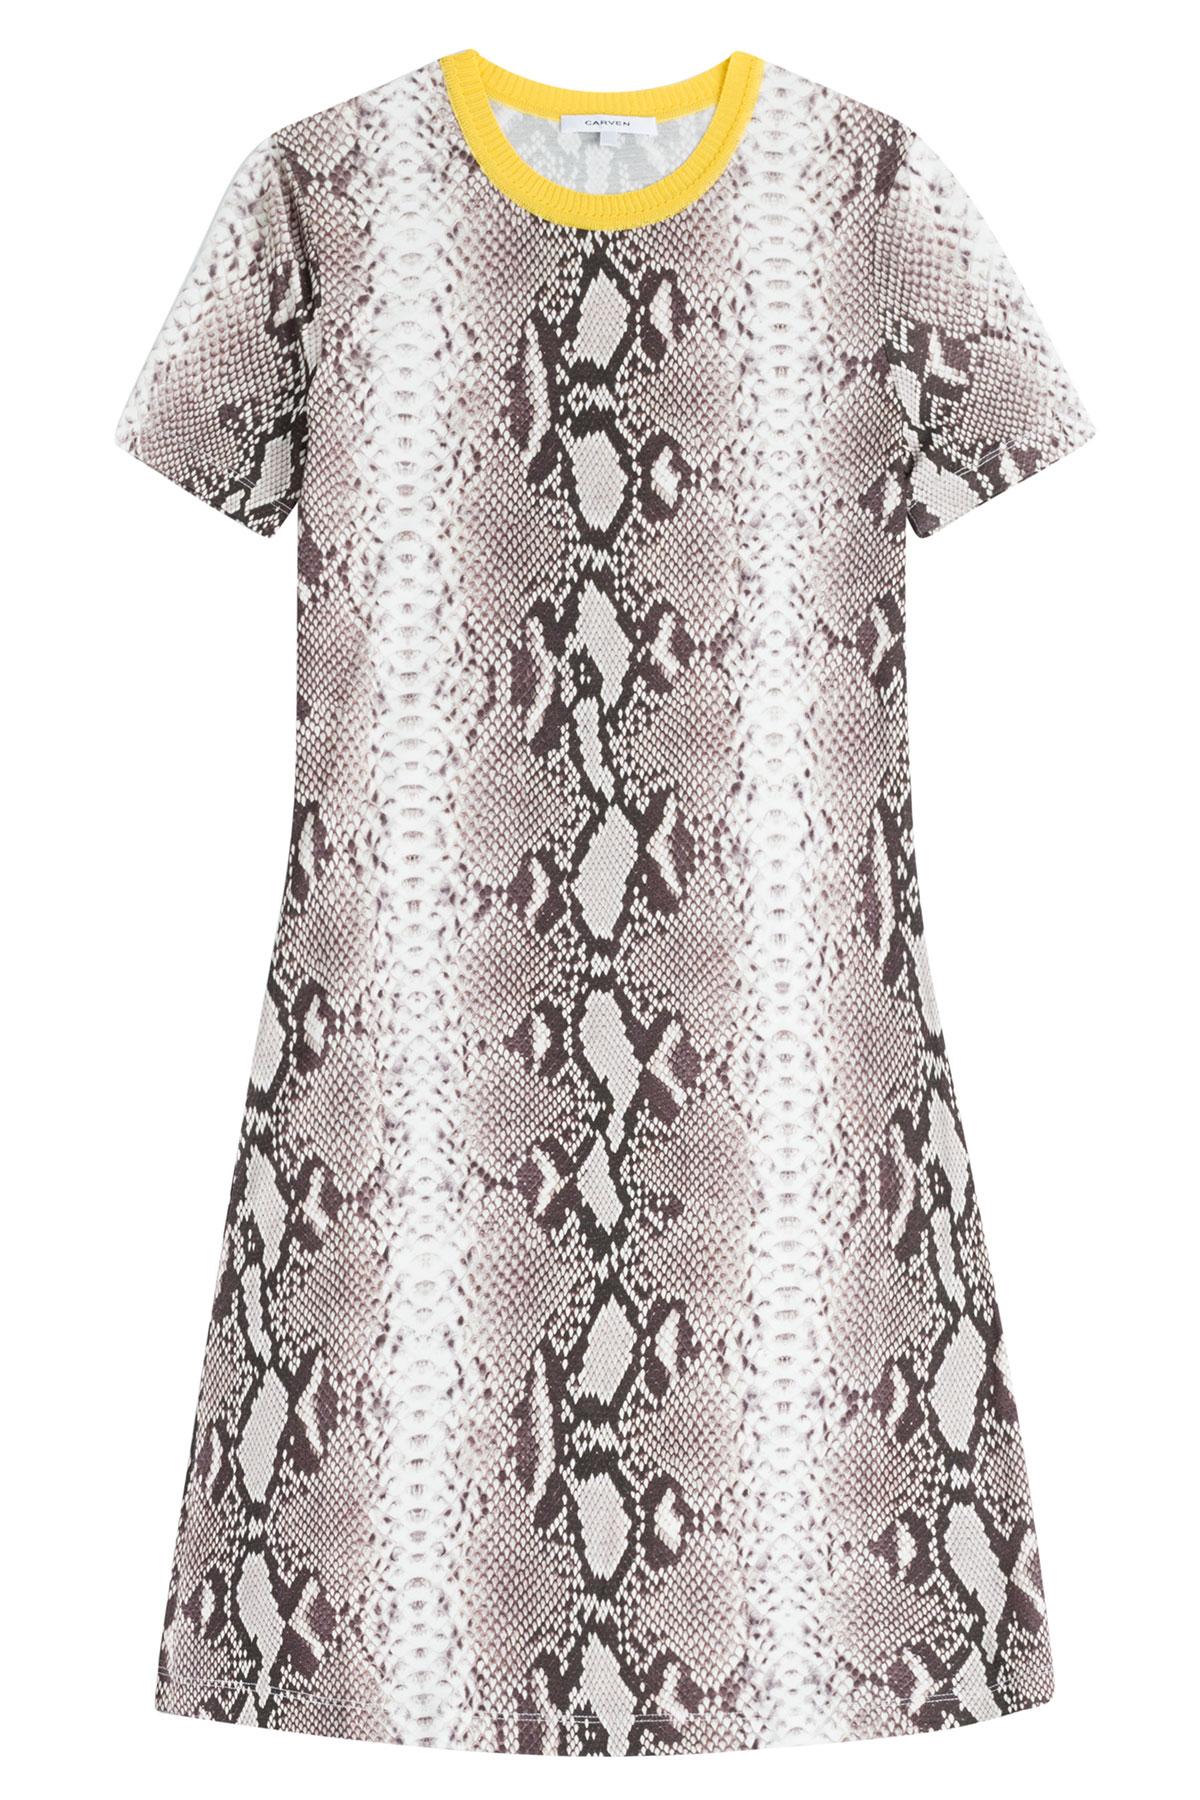 Carven Snake Skin Print Paneled Dress In Black Lyst